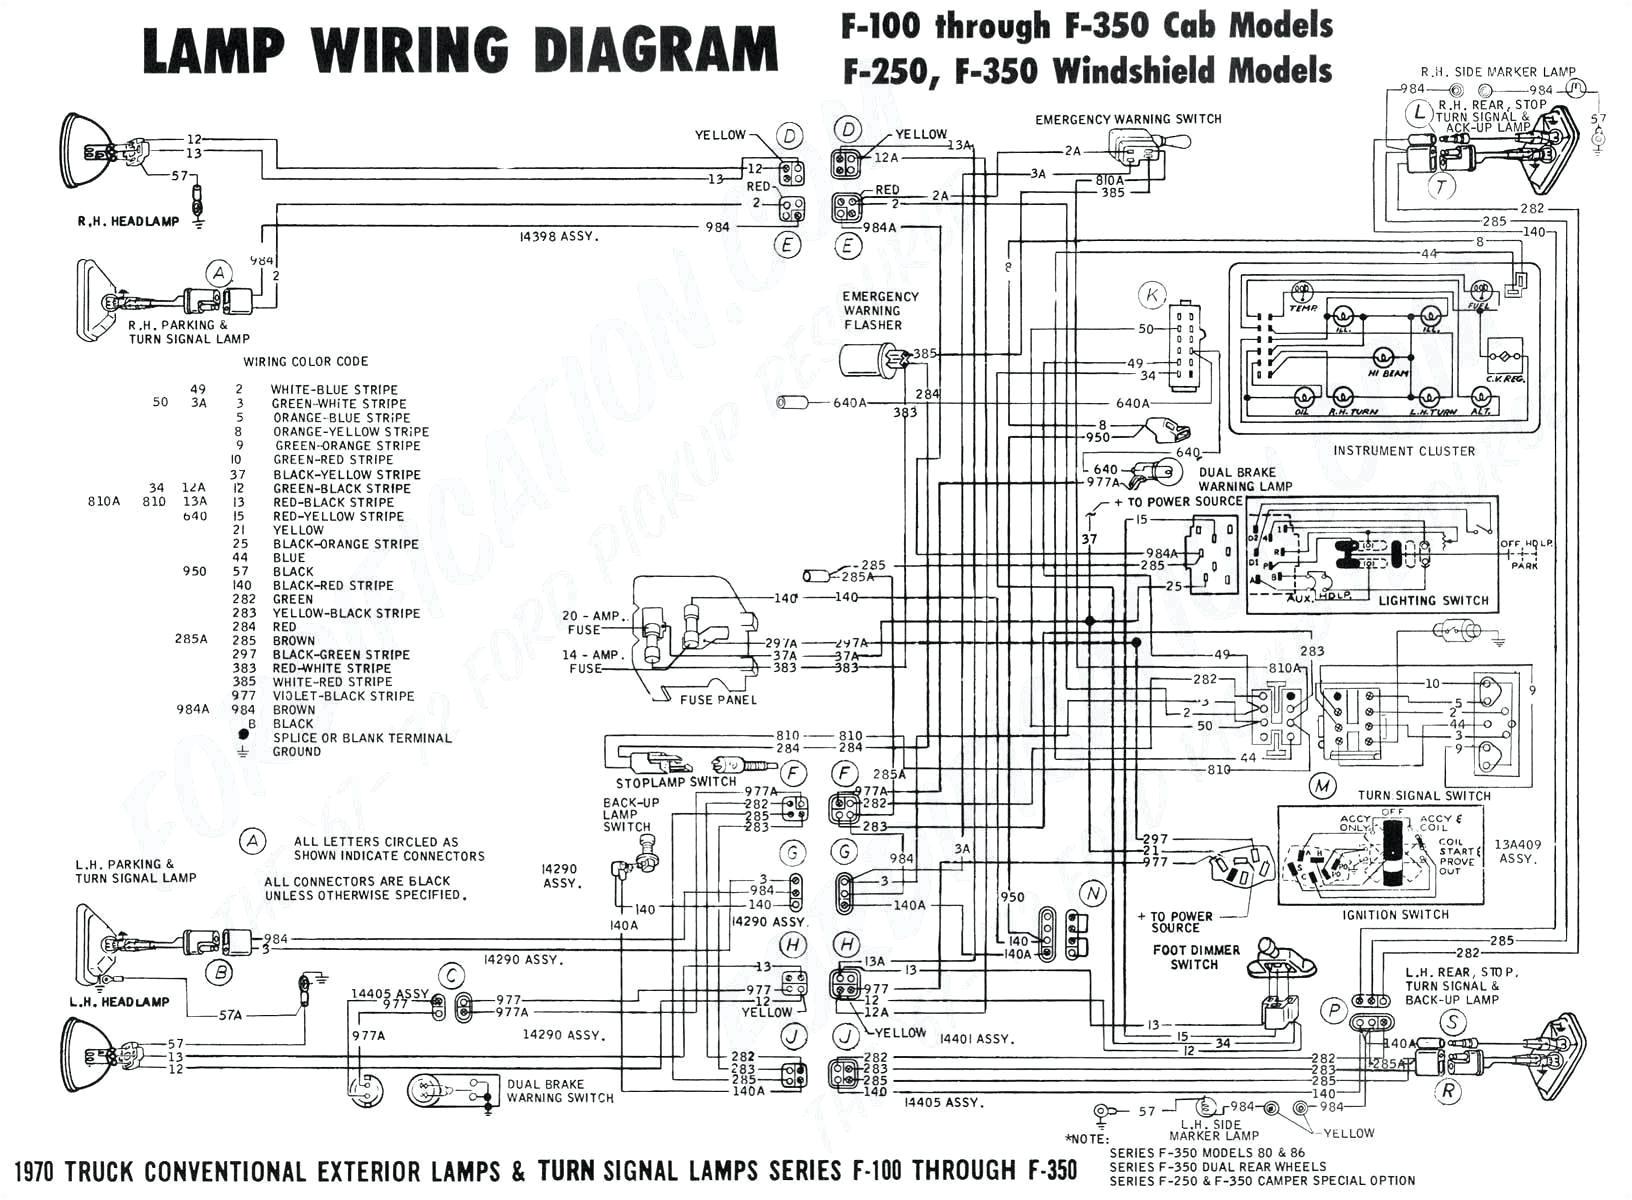 traeger wiring diagram unique 1999 f53 wiring diagram smart wiring diagrams e280a2 of traeger wiring diagram jpg